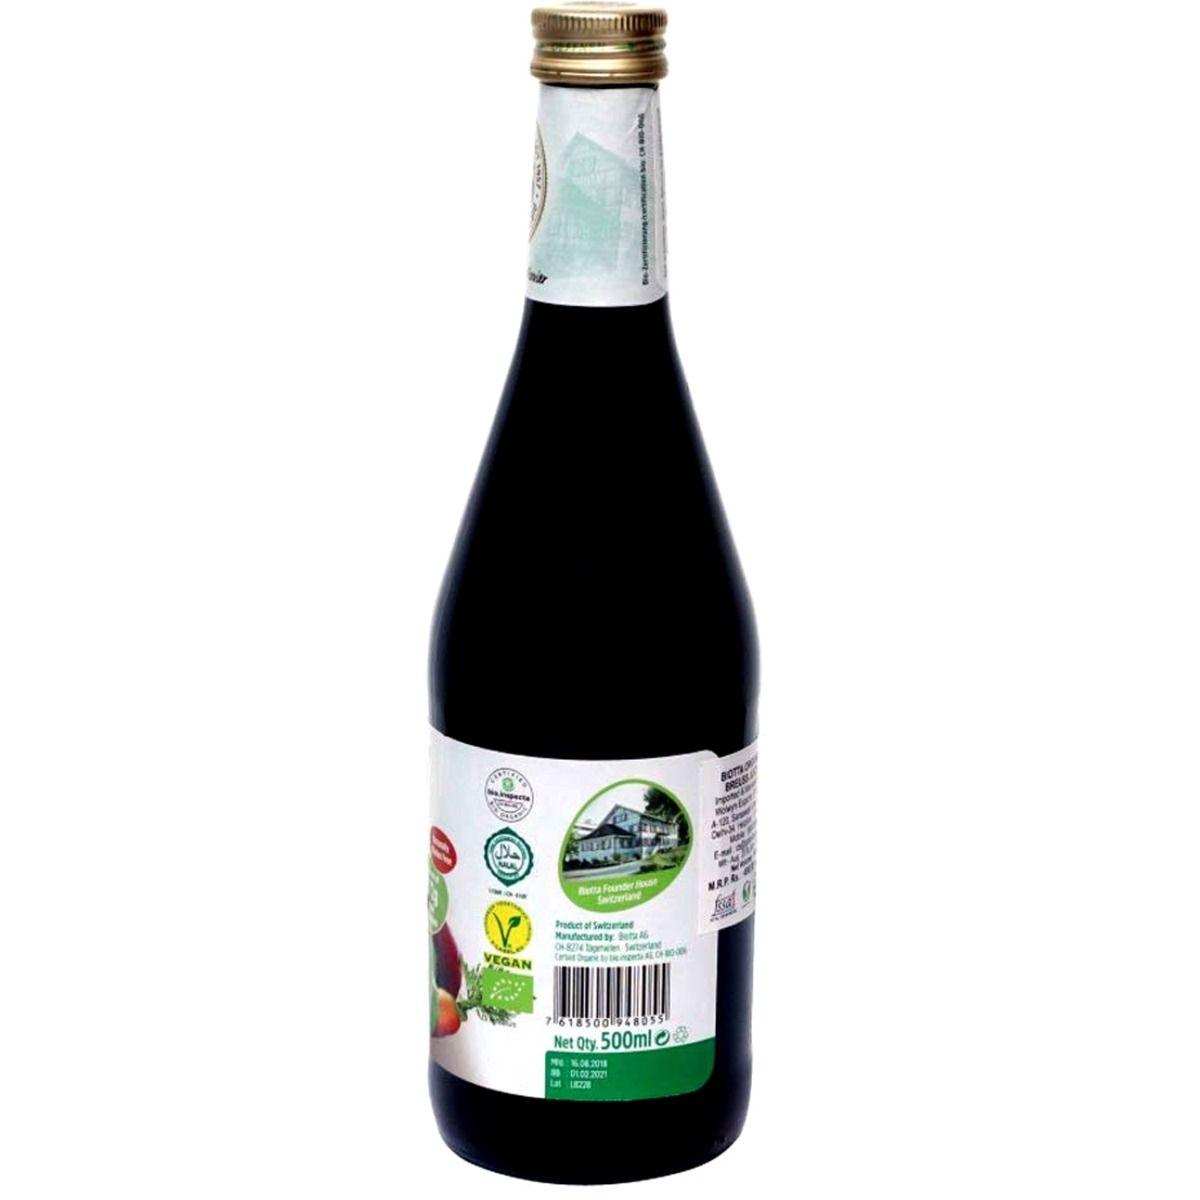 Biotta Breuss Vegetable Juice, 500 ml, Pack of 1